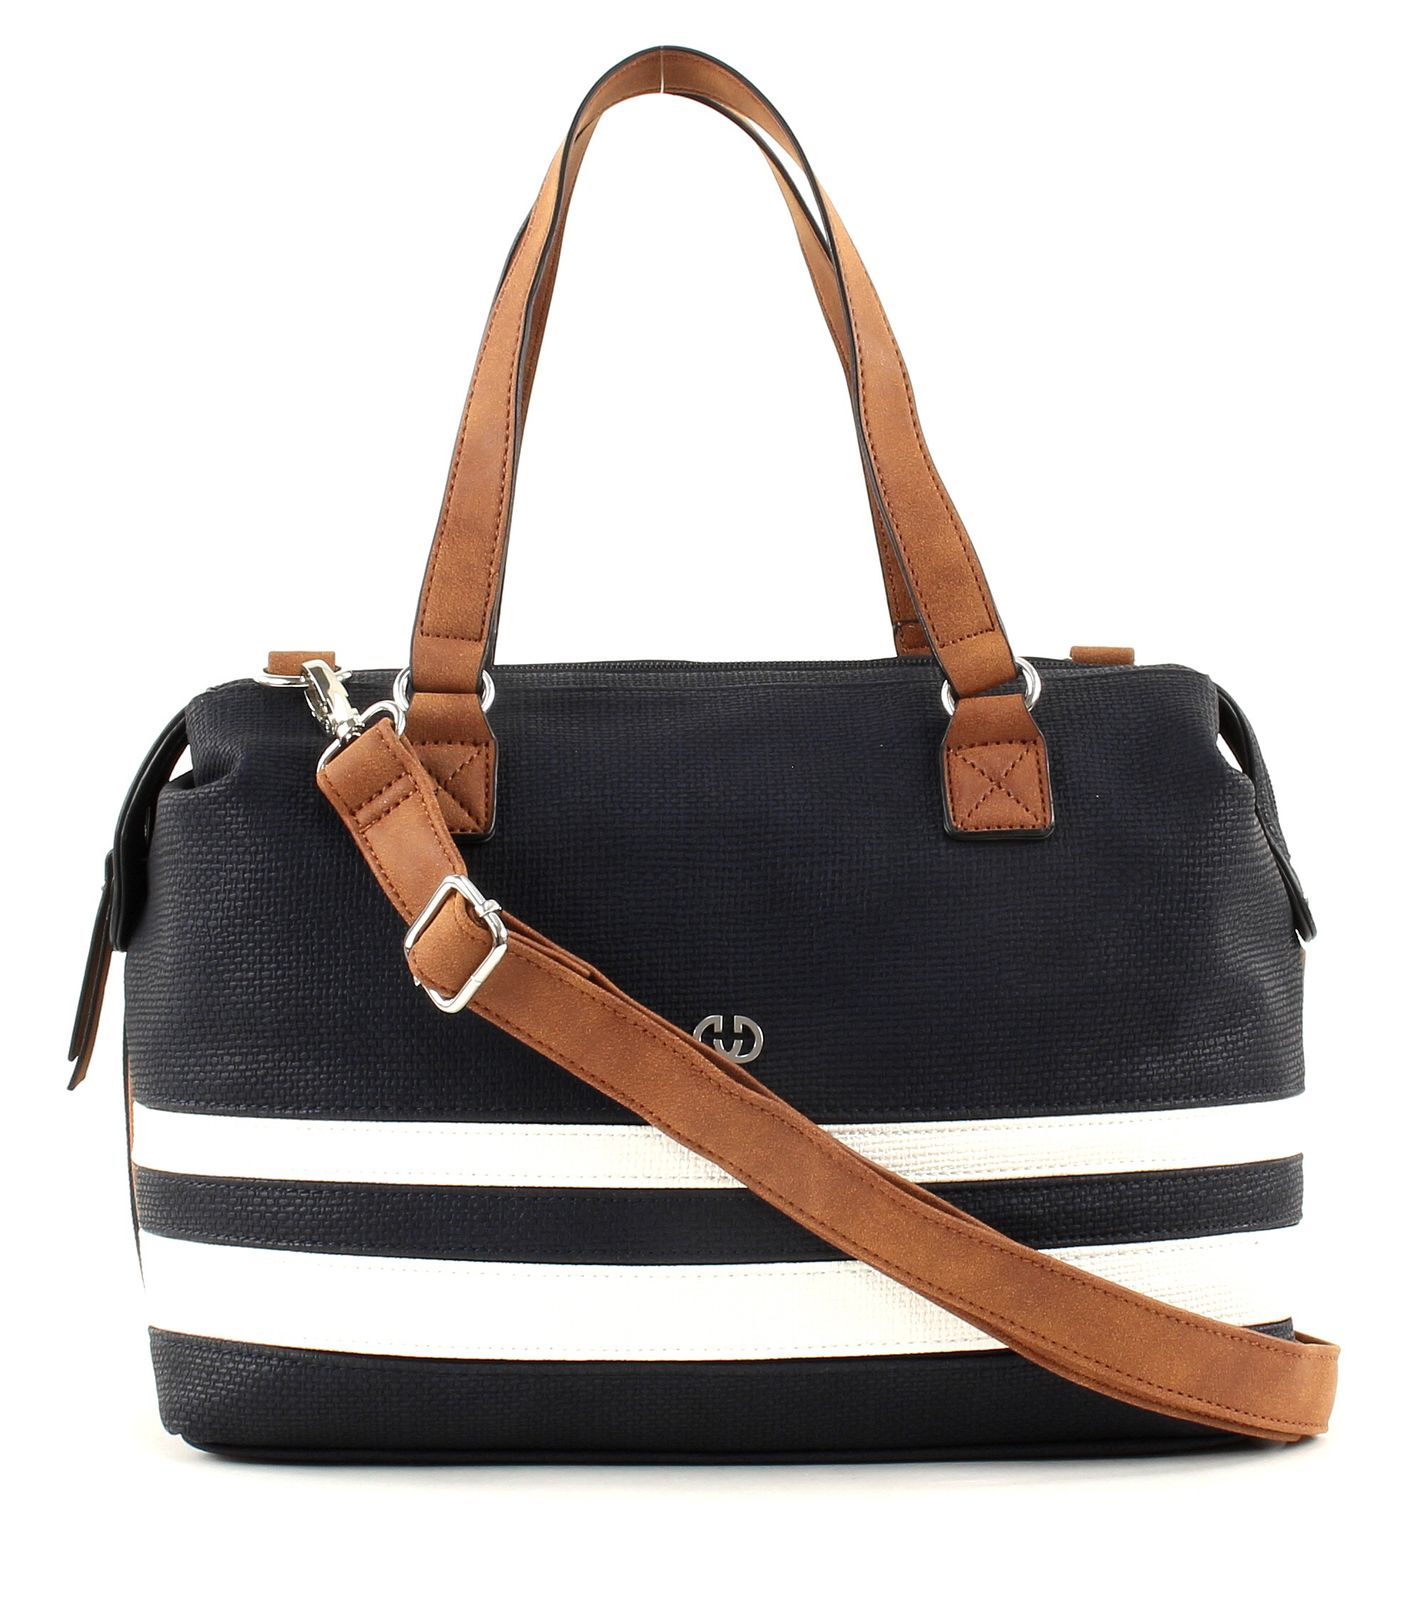 gerry weber summer wish handbag mhz handtasche. Black Bedroom Furniture Sets. Home Design Ideas